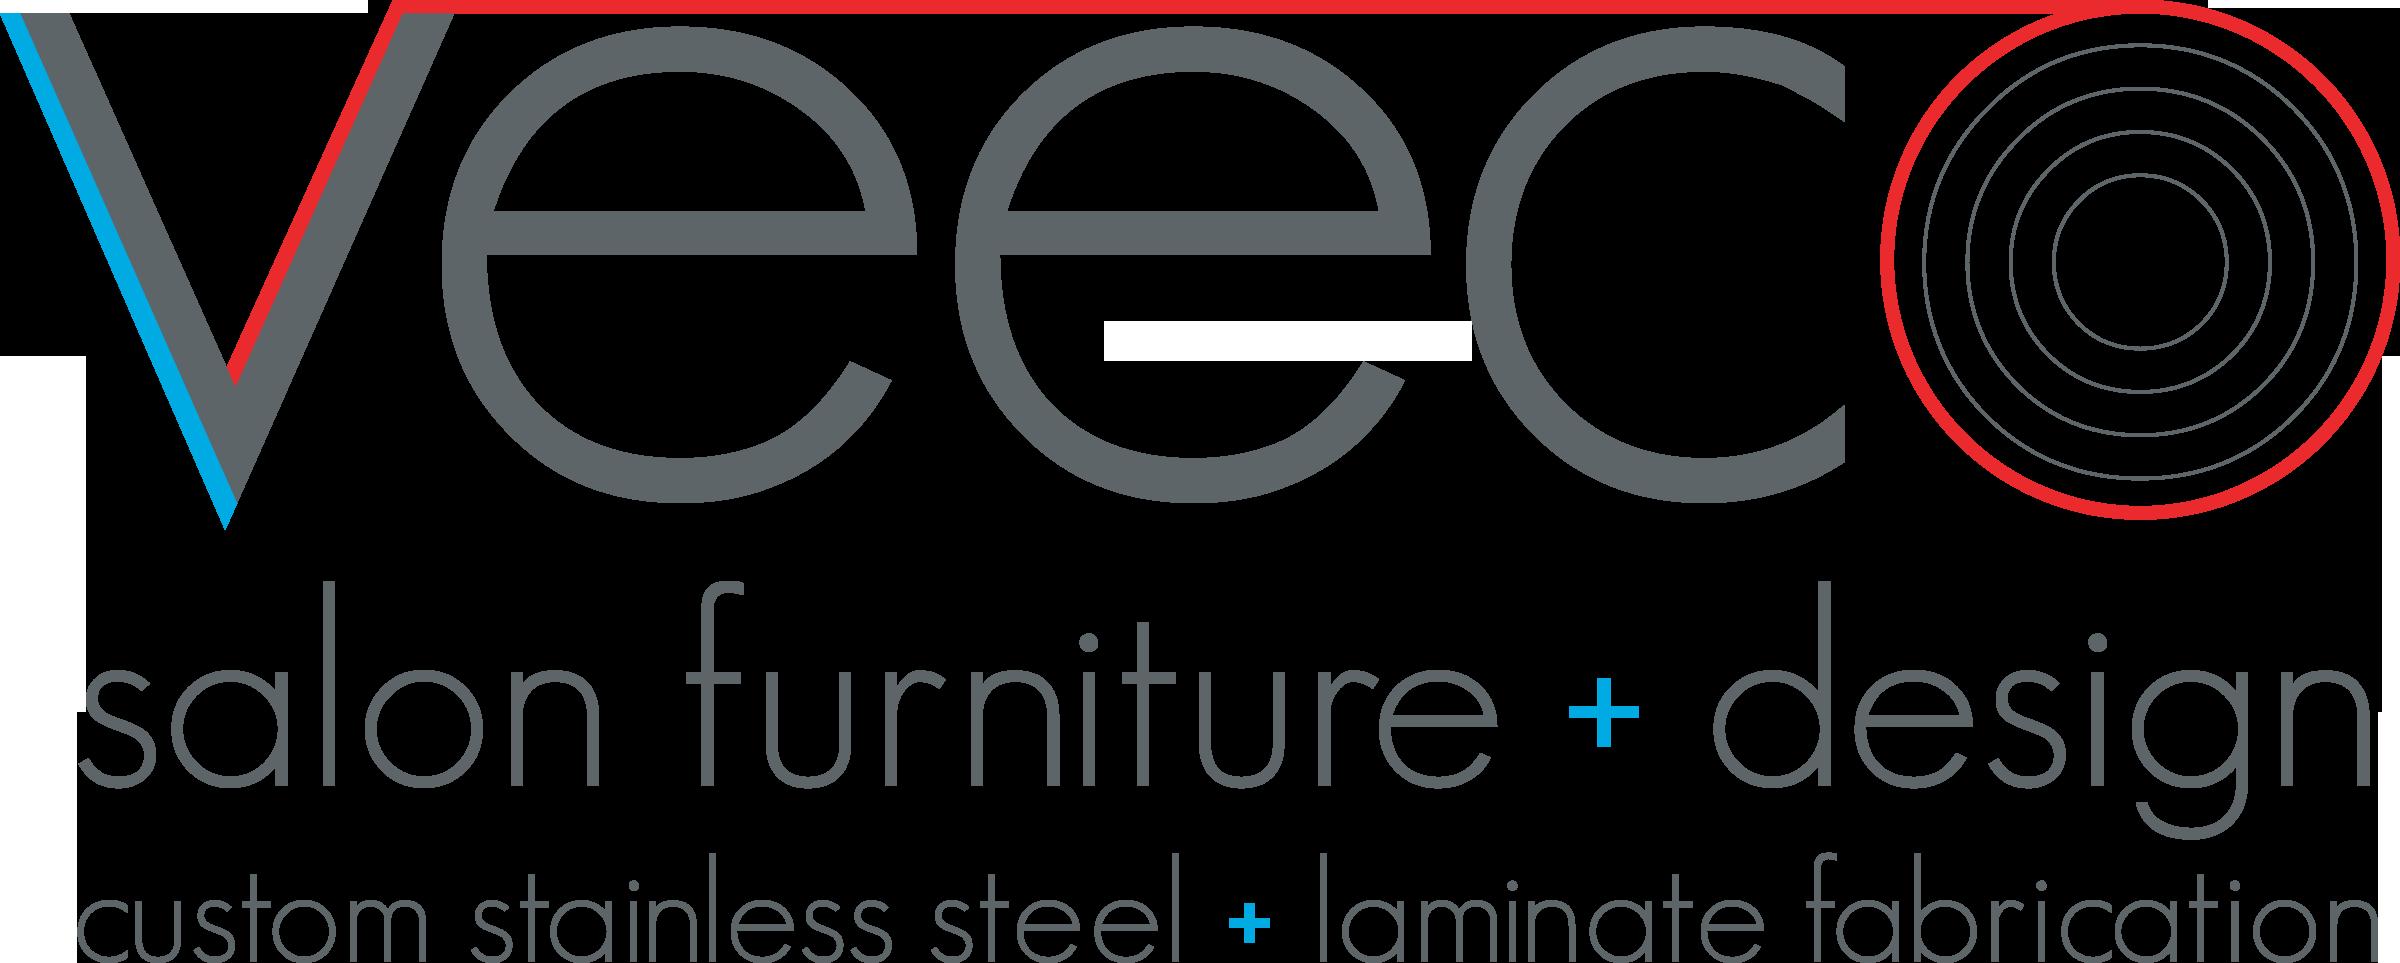 Veeco salon furniture design celebrates their new for Salon furniture design